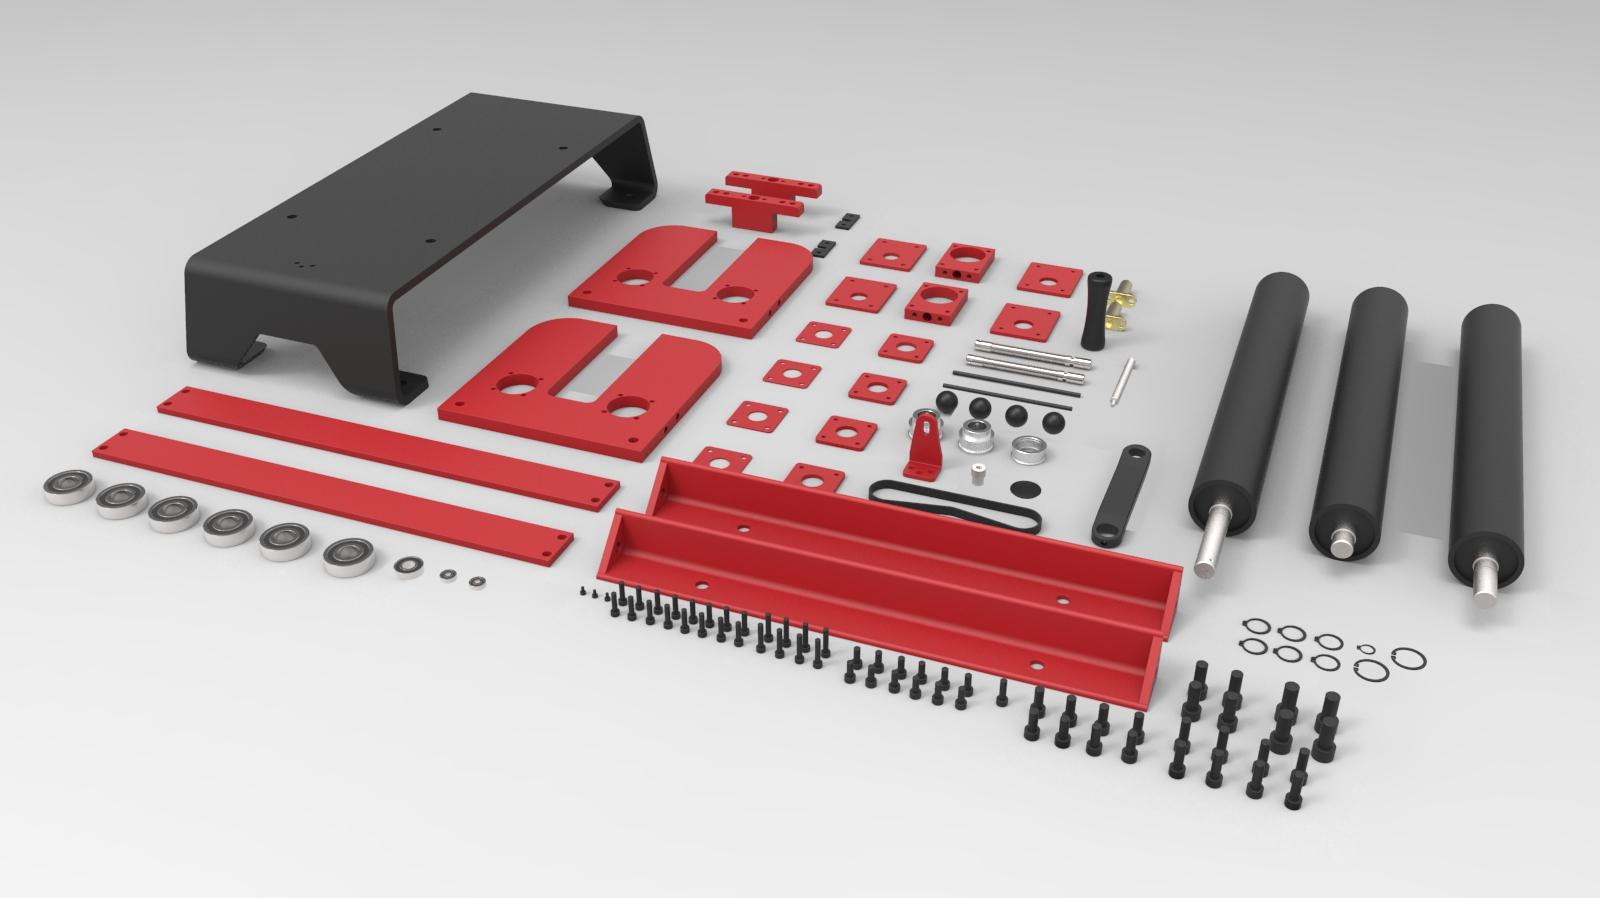 sheet metal rollers金属板辊设备3D图纸 STEP格式